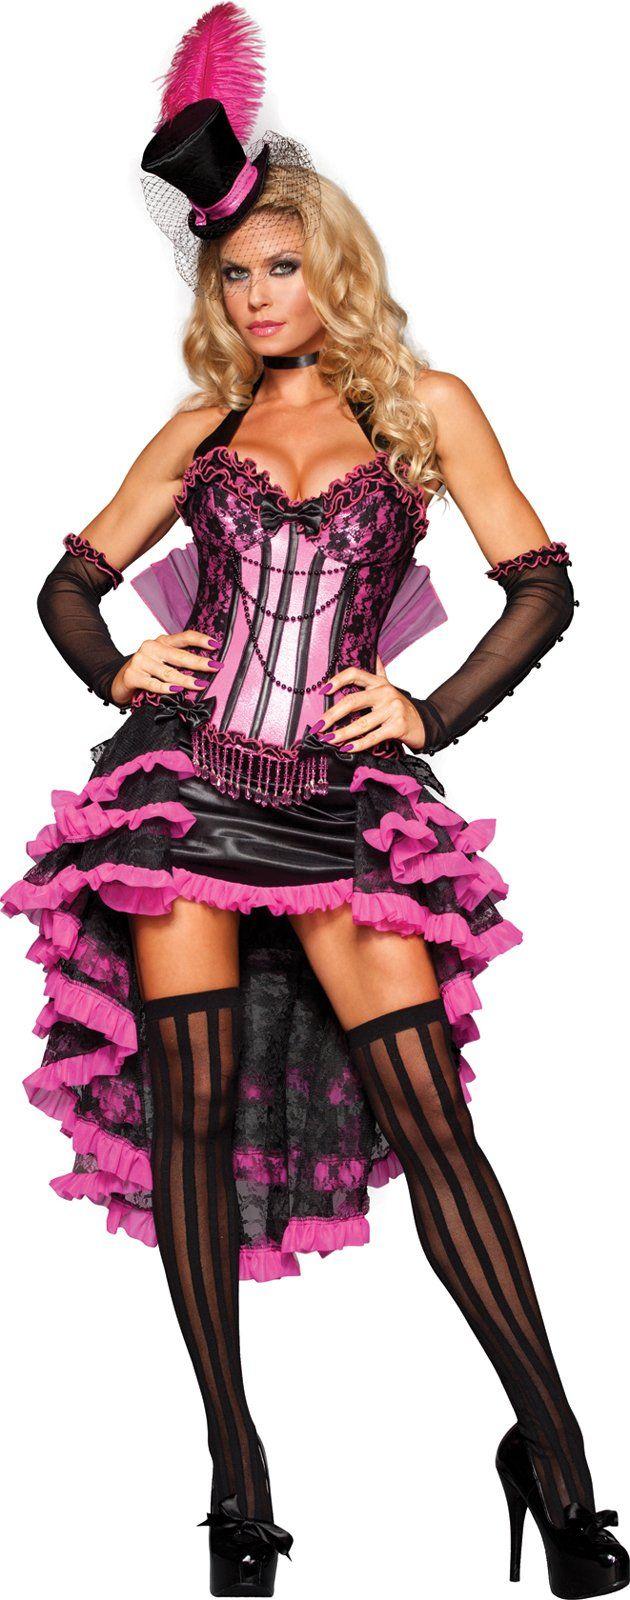 Home ladies costumes rodeo gal costume - Burlesque Beauty Adult Costume Burlesque Halloween Costumessexy Womens